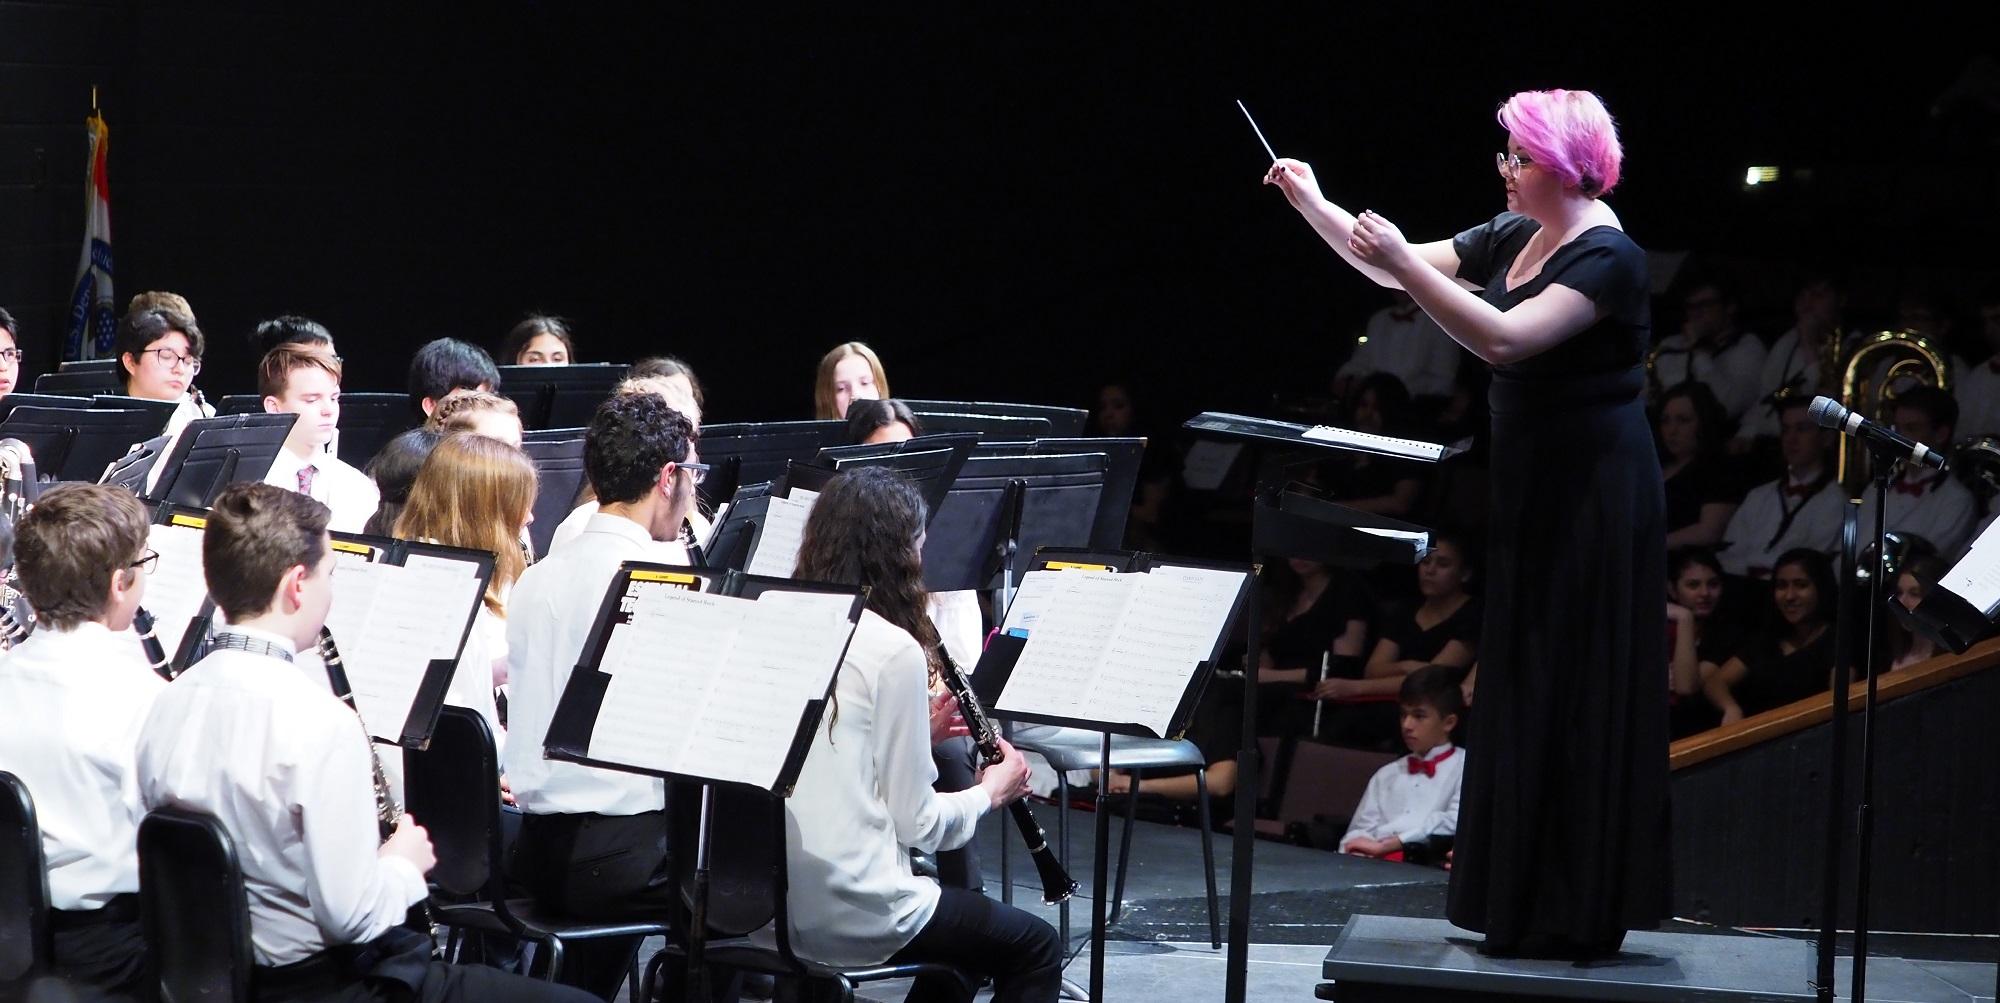 Student Conductor - Intern